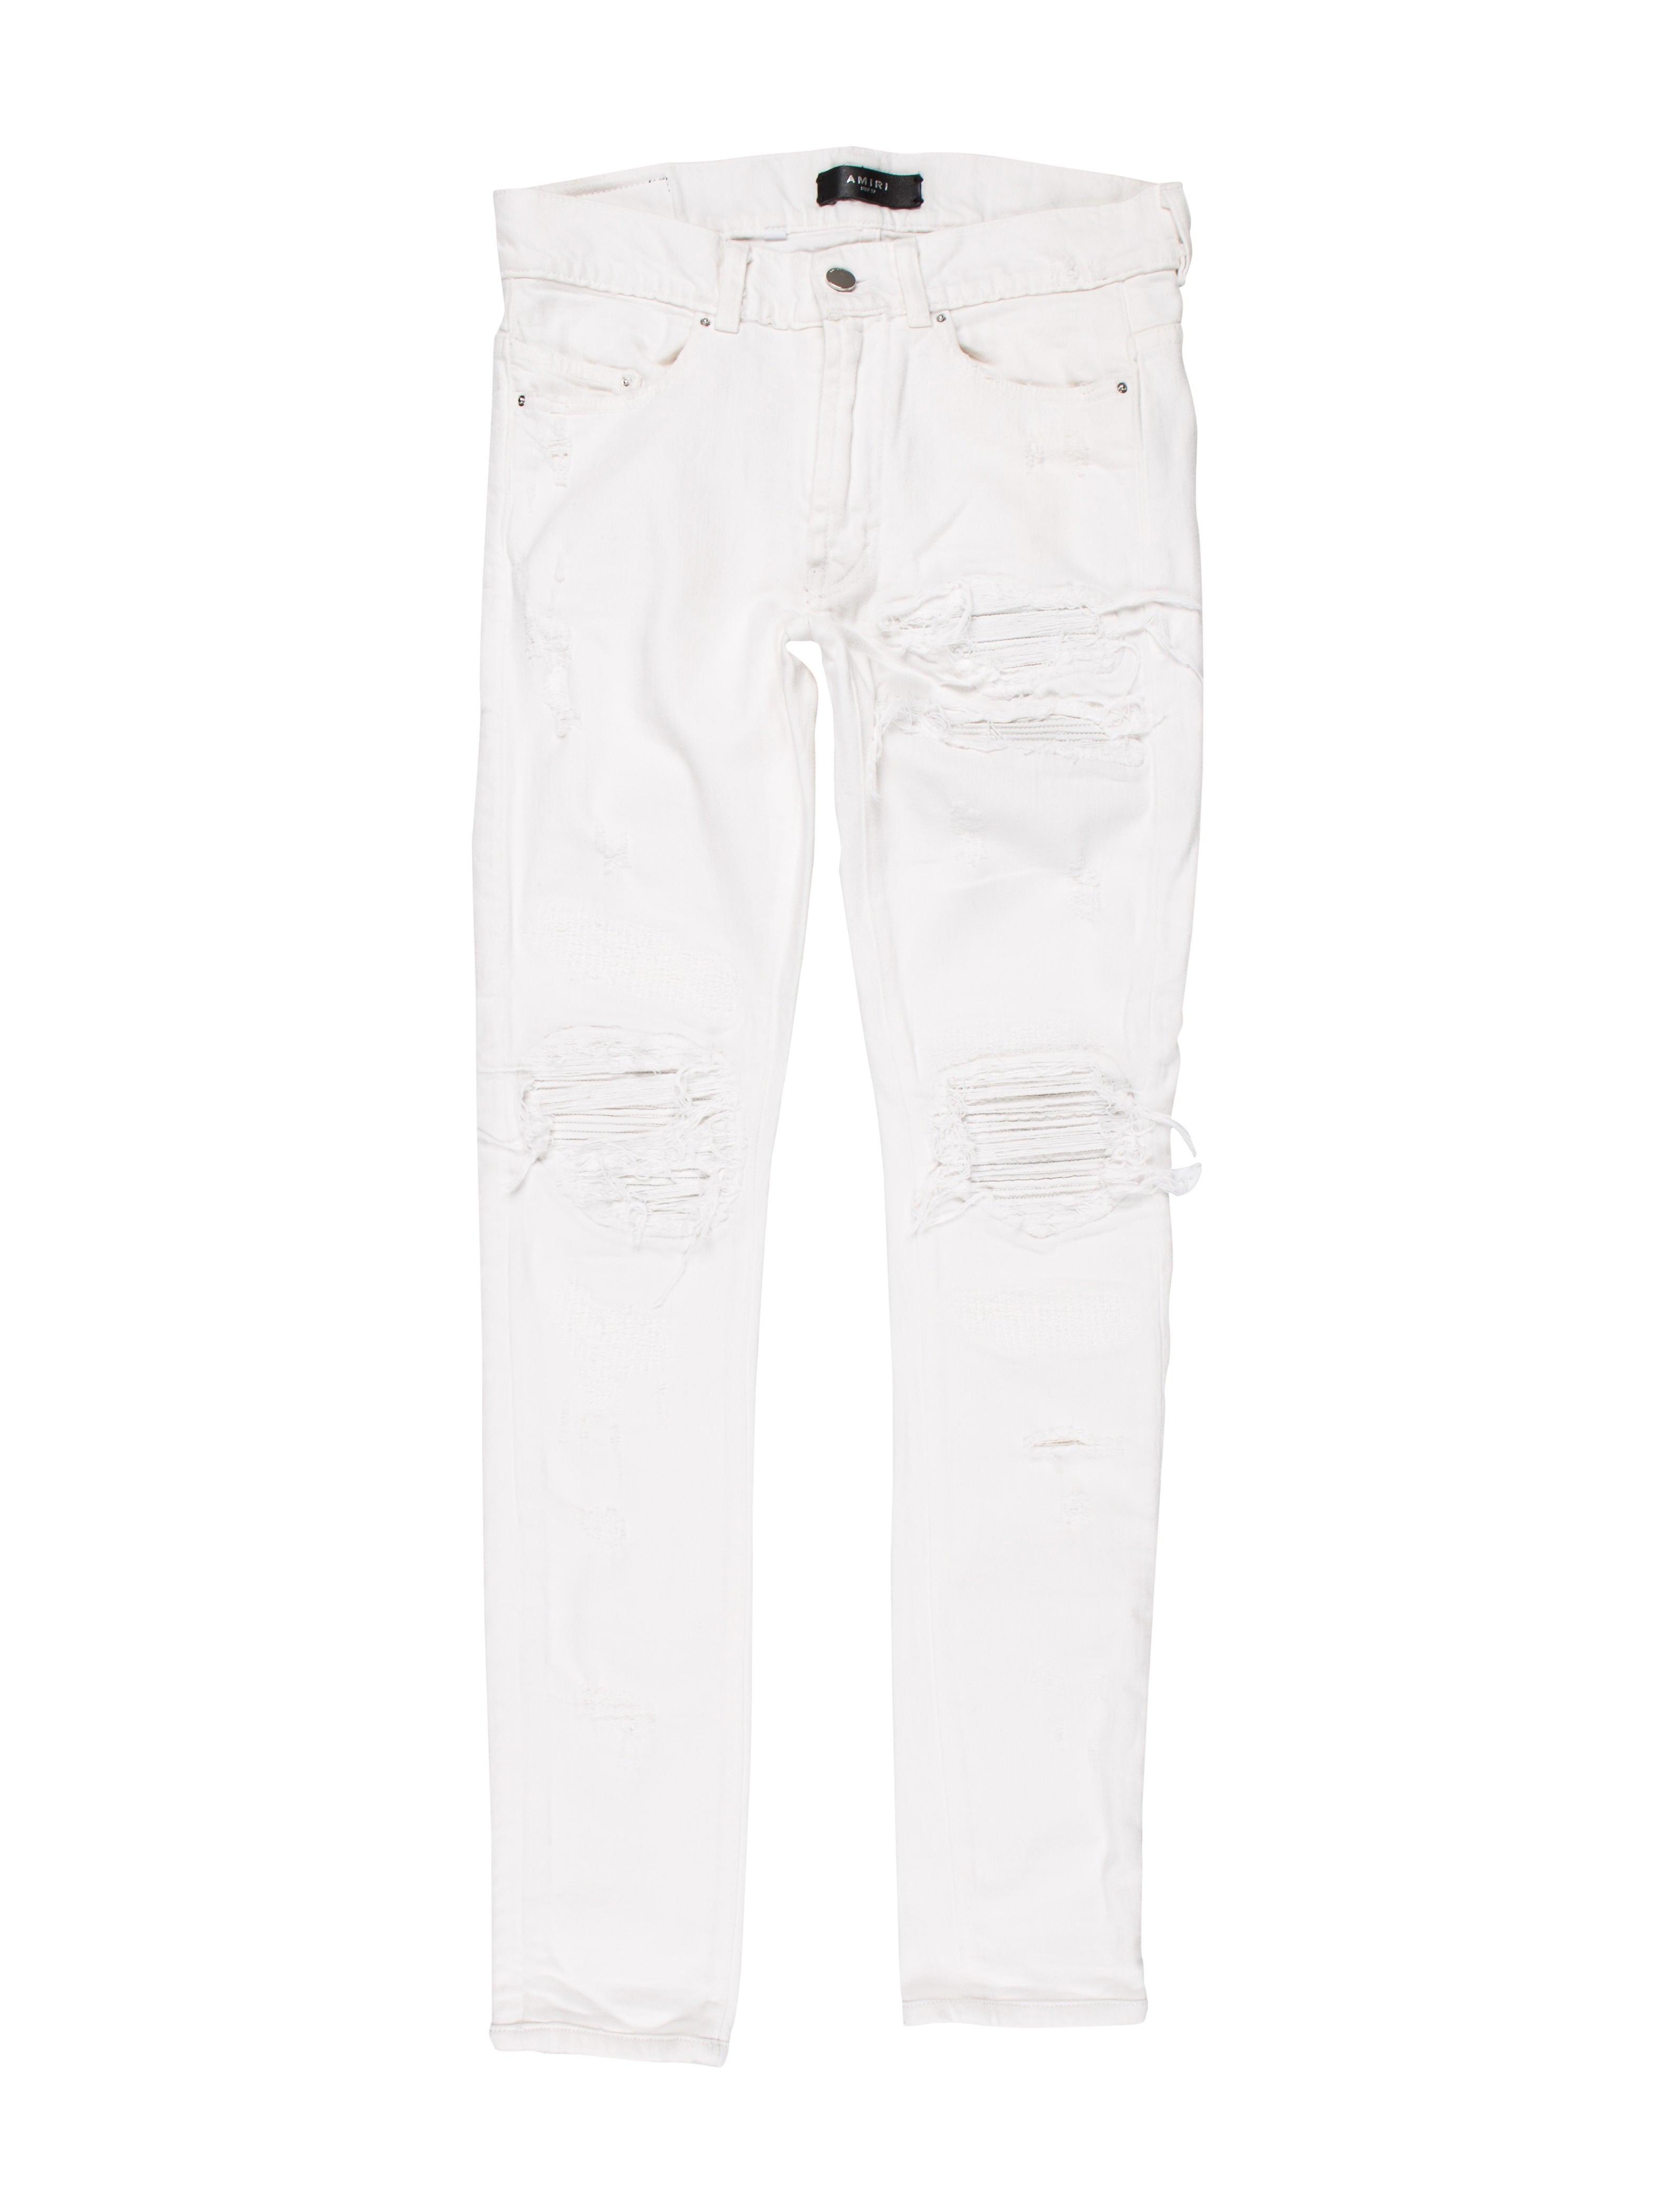 eadb7b8afda Amiri MX-1 Distressed Skinny Jeans - Clothing - AMIRI20633   The ...